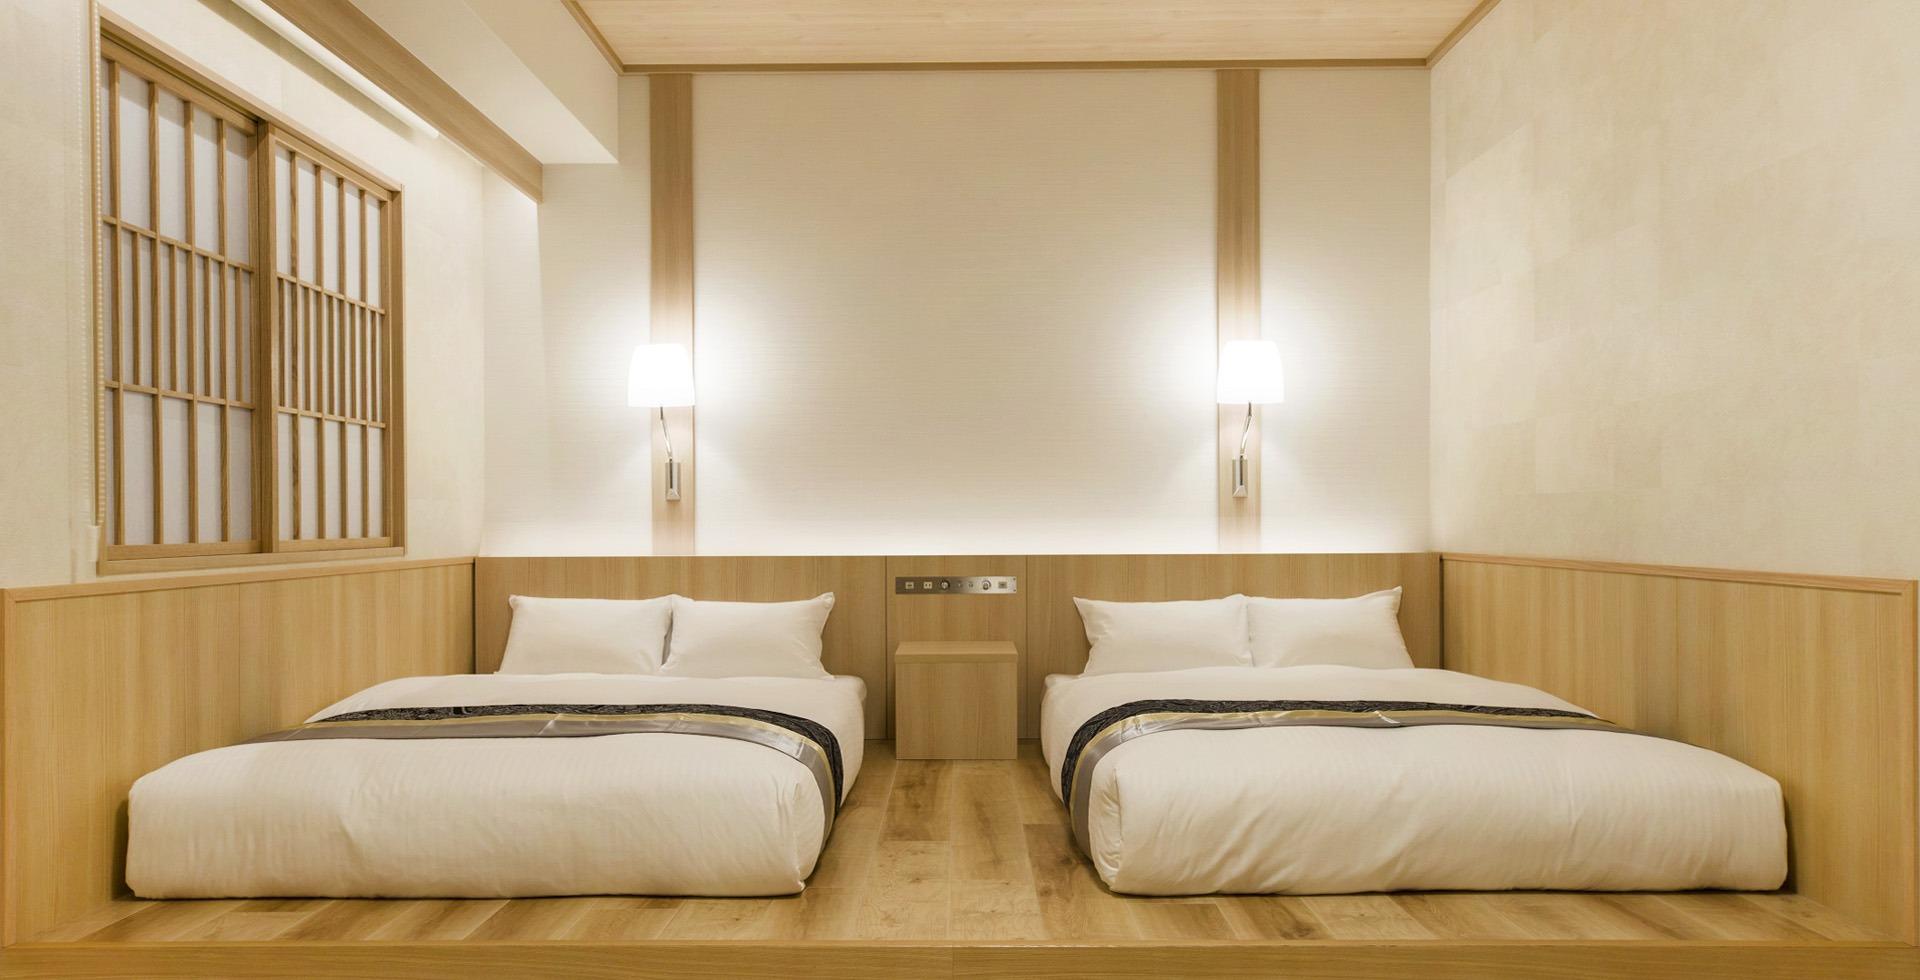 I AM HOTEL|位於大阪難波鬧區的新型態旅館